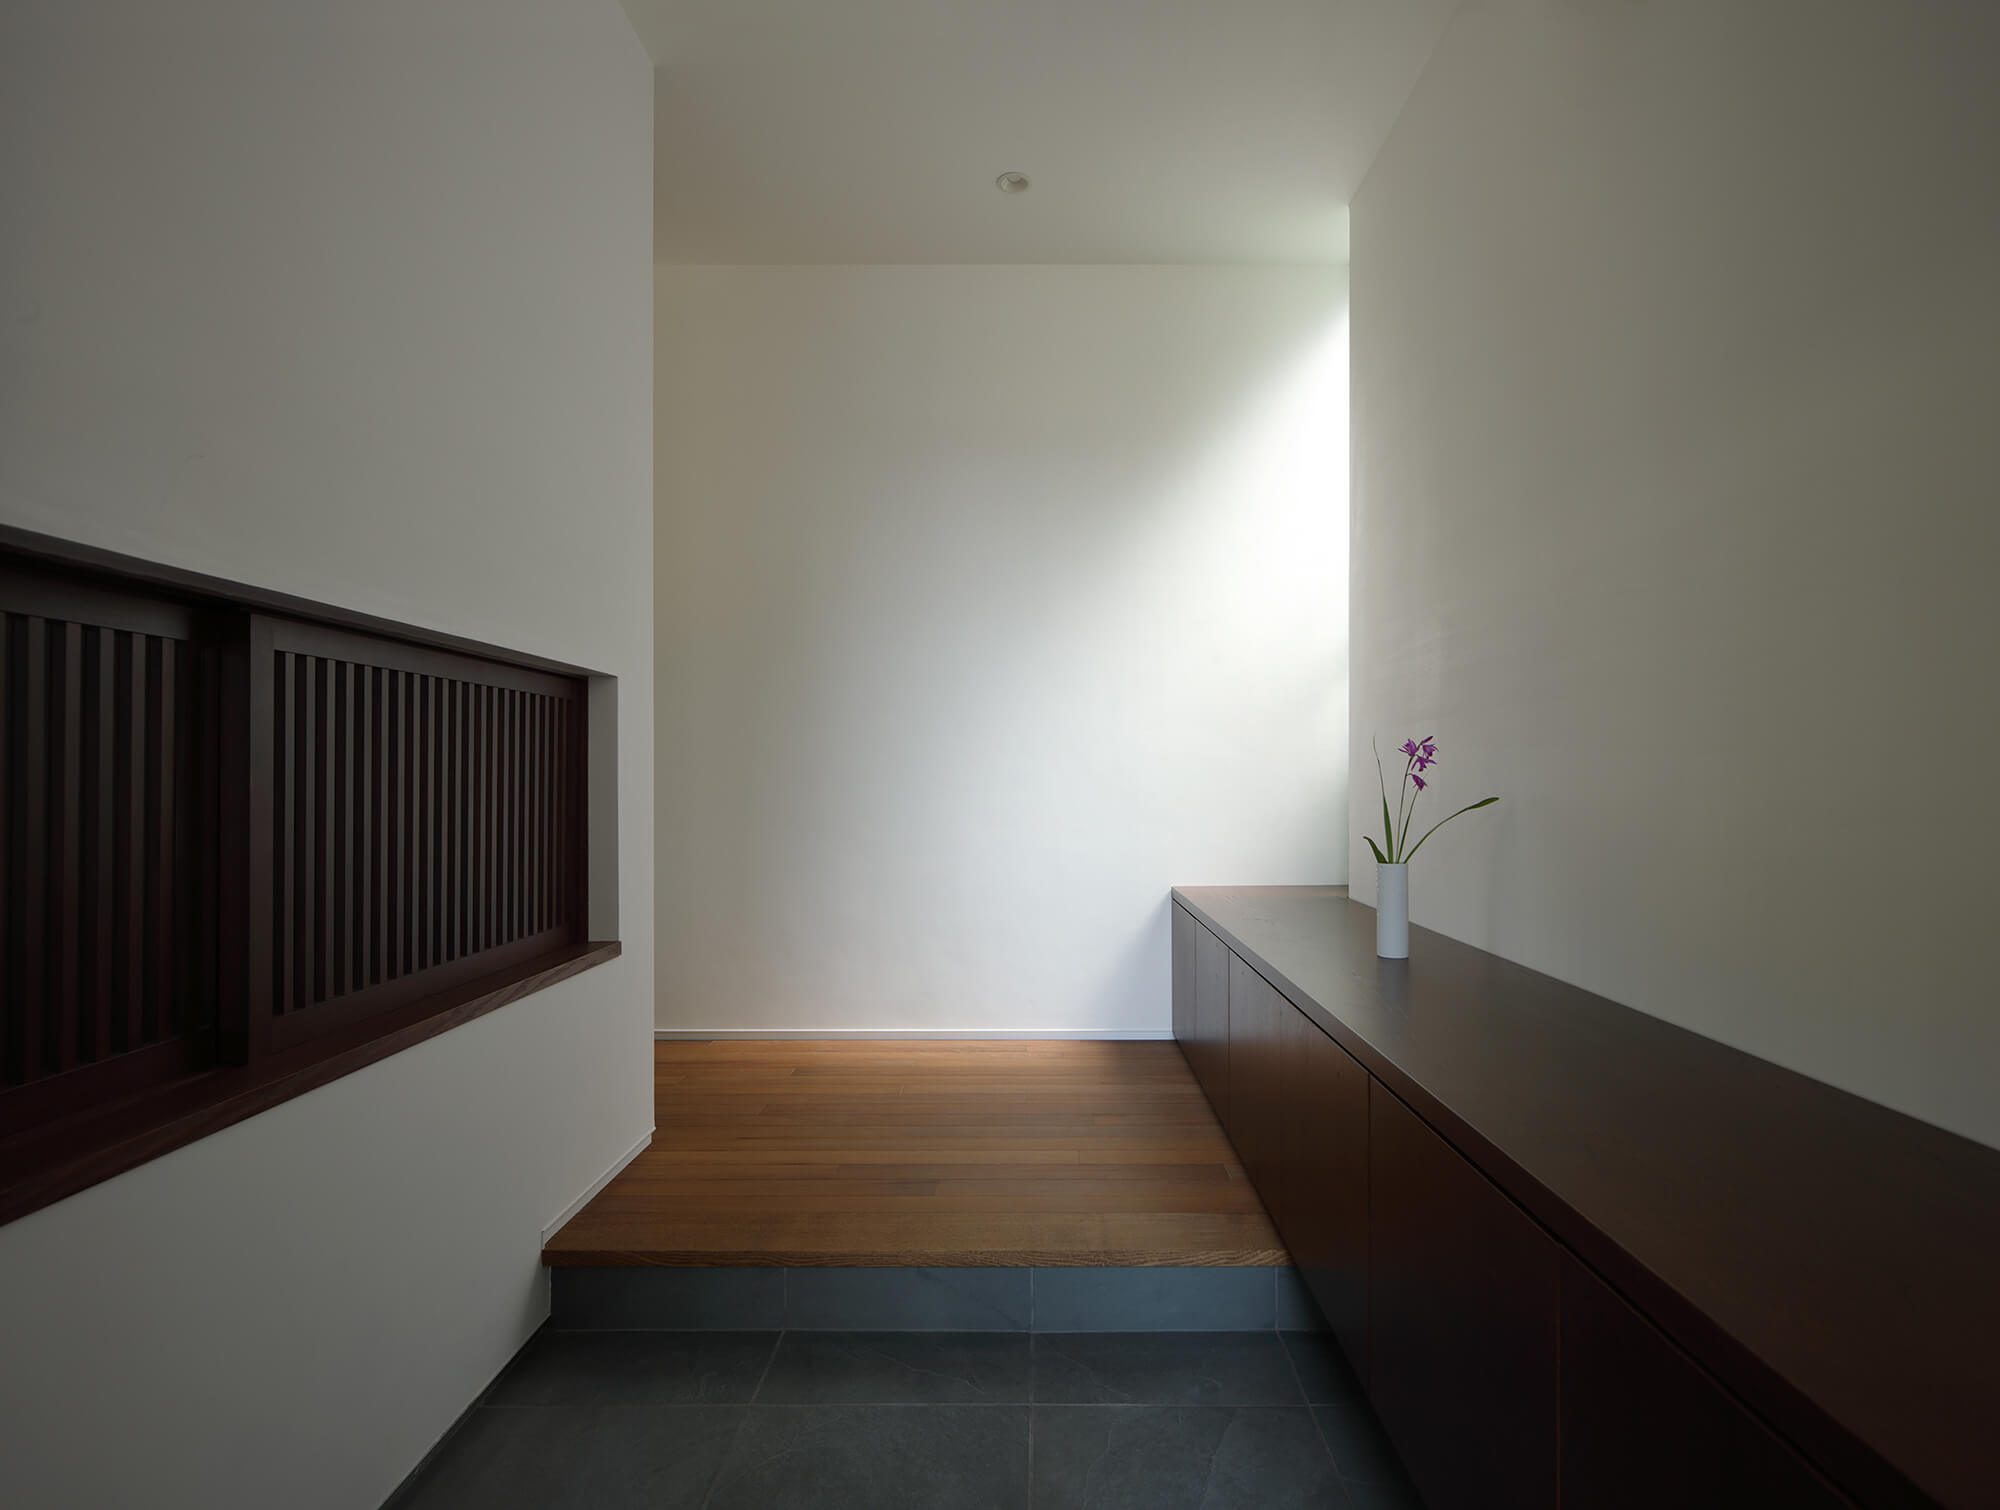 『福重の家』-福岡県福岡市-建築写真・竣工写真・インテリア写真2